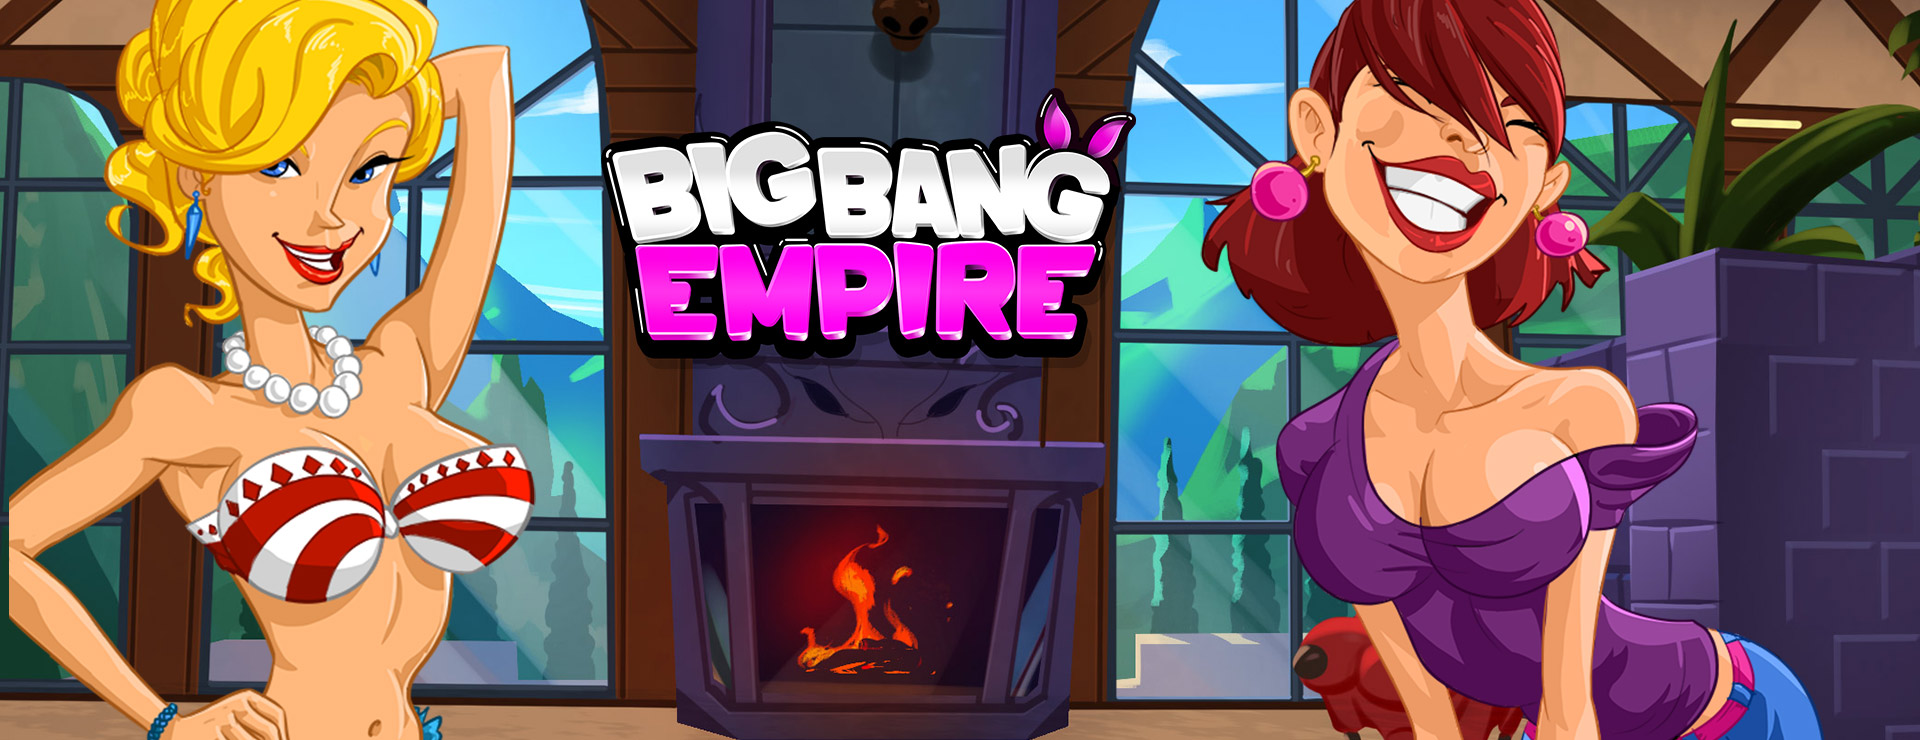 Big Bang Empire Online - RPG Spiel